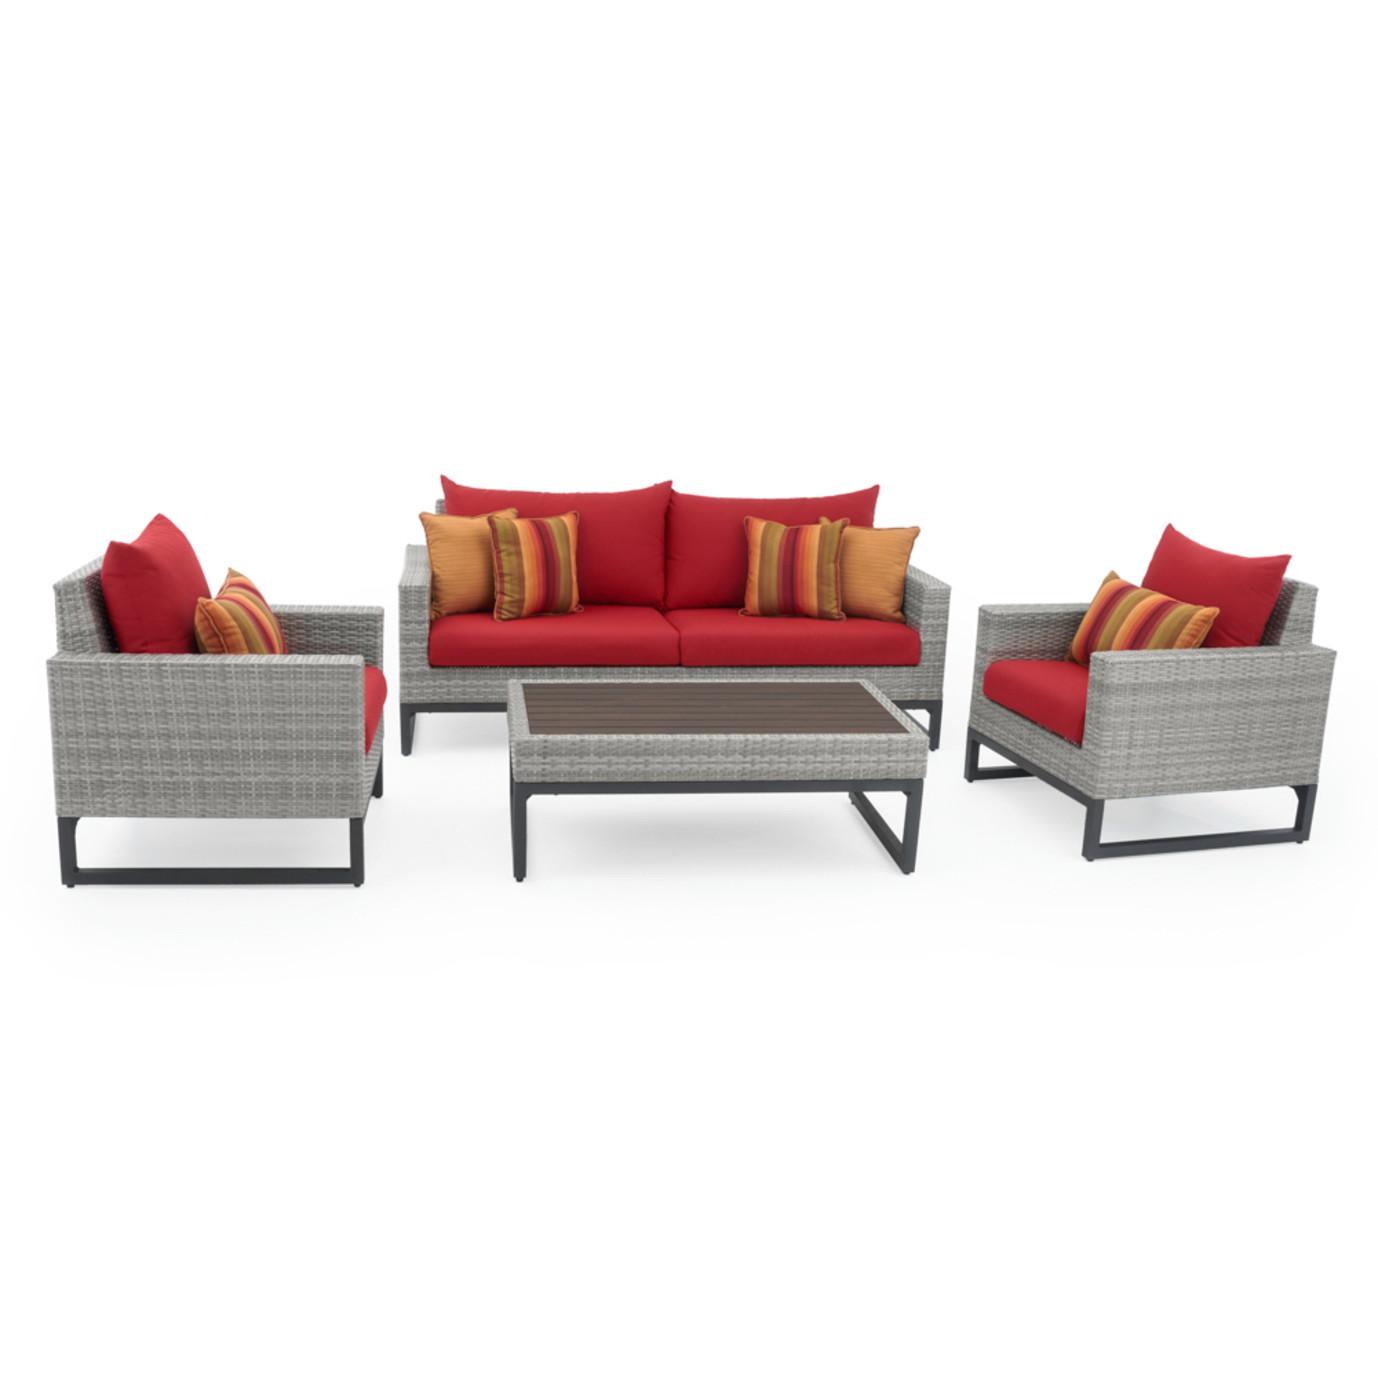 Milo™Gray 4pc Seating Set - Sunset Red